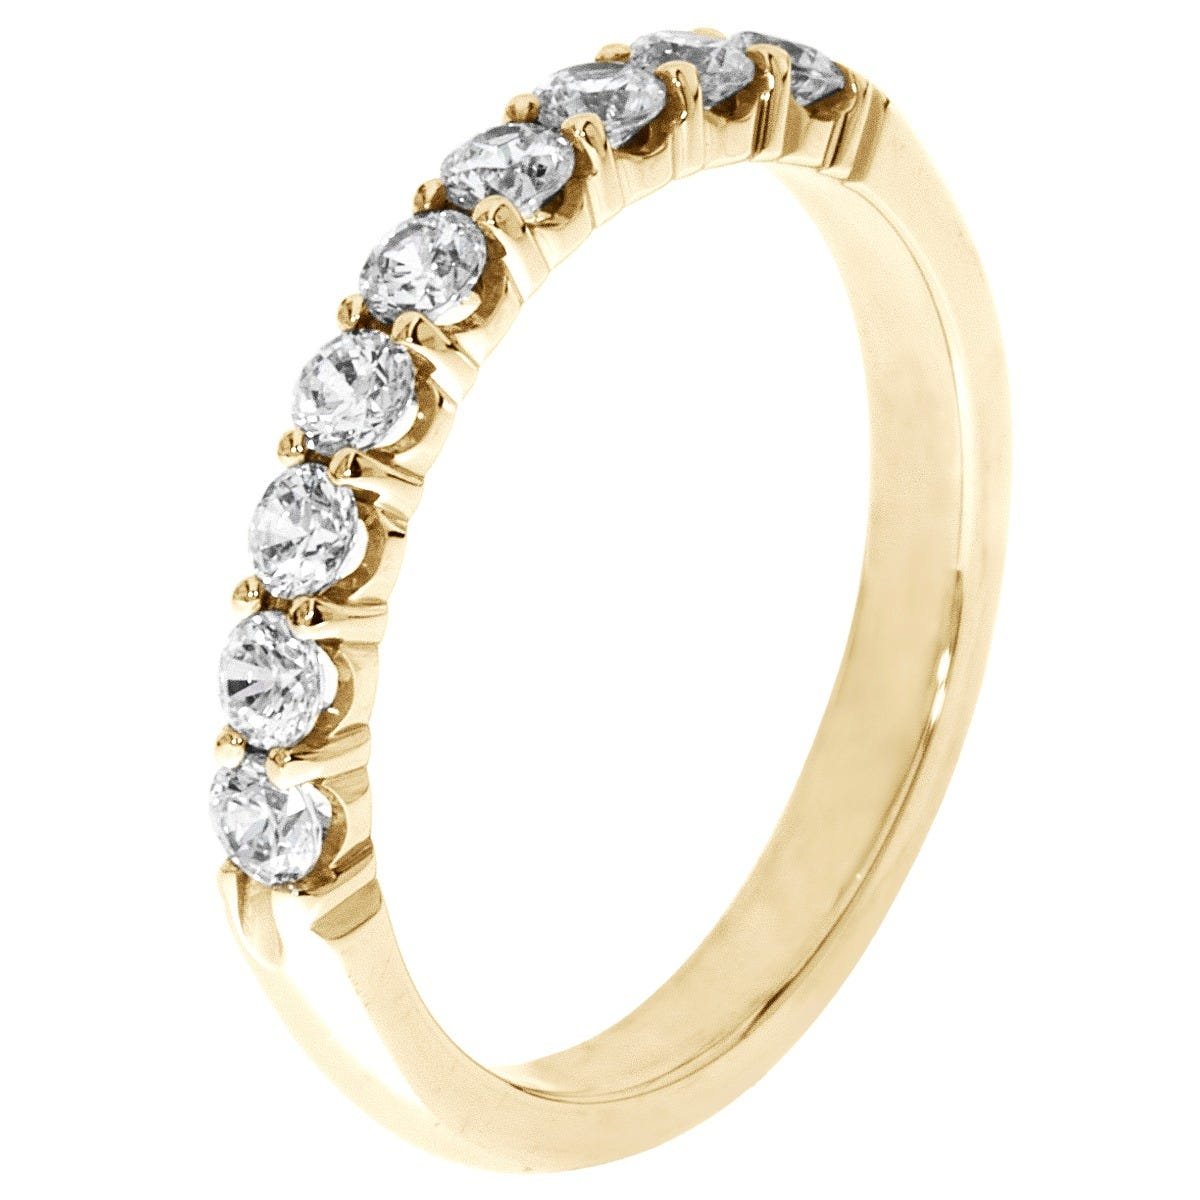 9-Stone Diamond Band 1/2 ctw. (G-H, I1-I2) 10k Yellow Gold